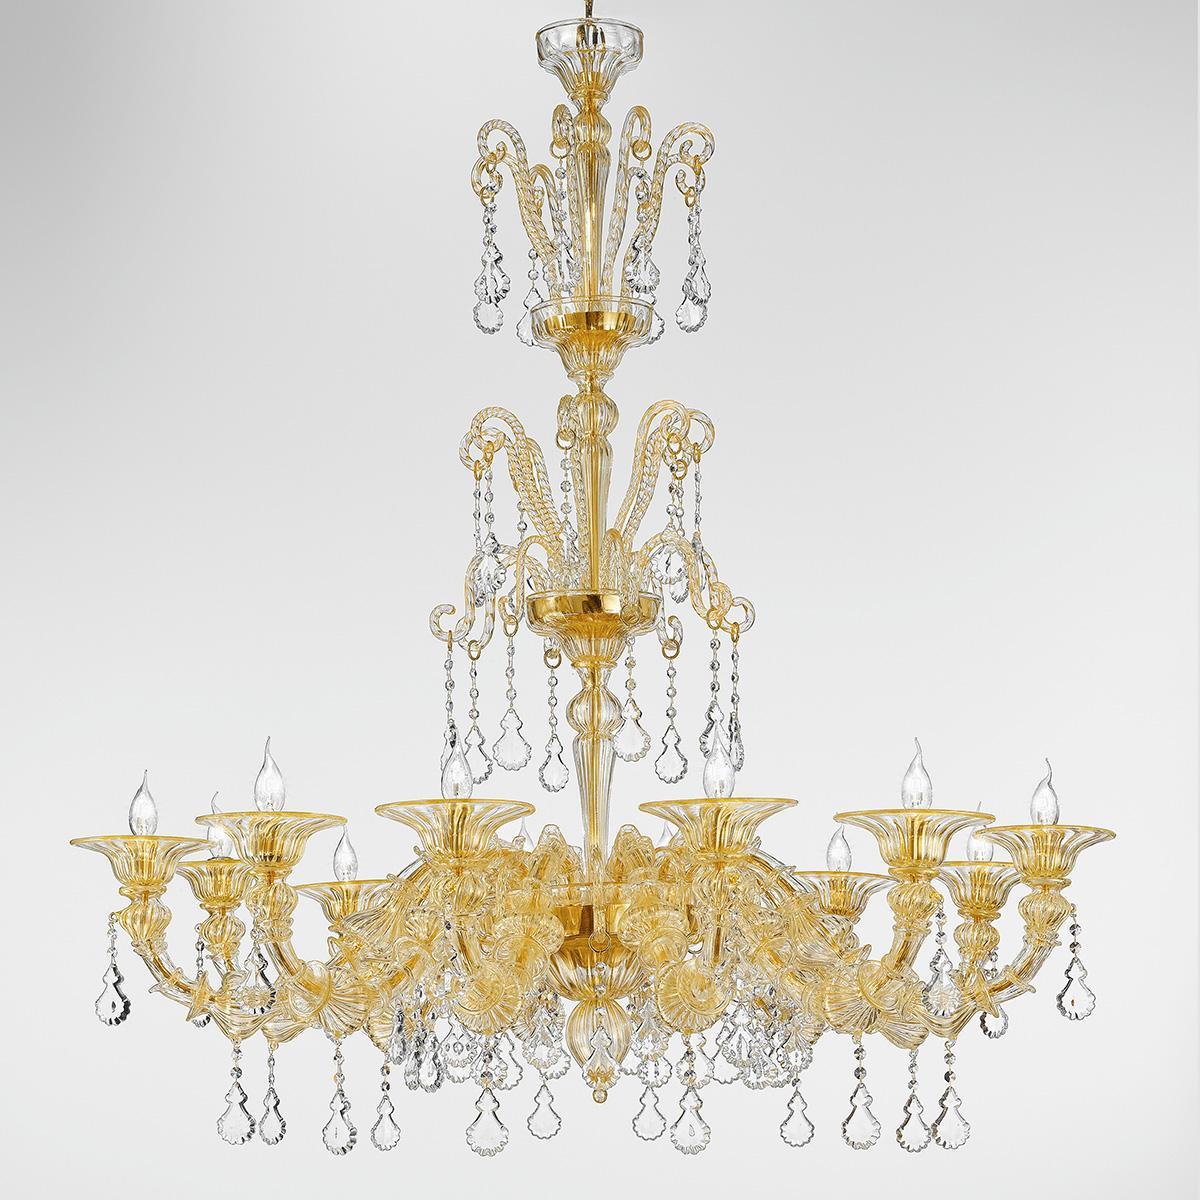 """Priscilla"" lustre en cristal de Murano - 12 lumières - or"